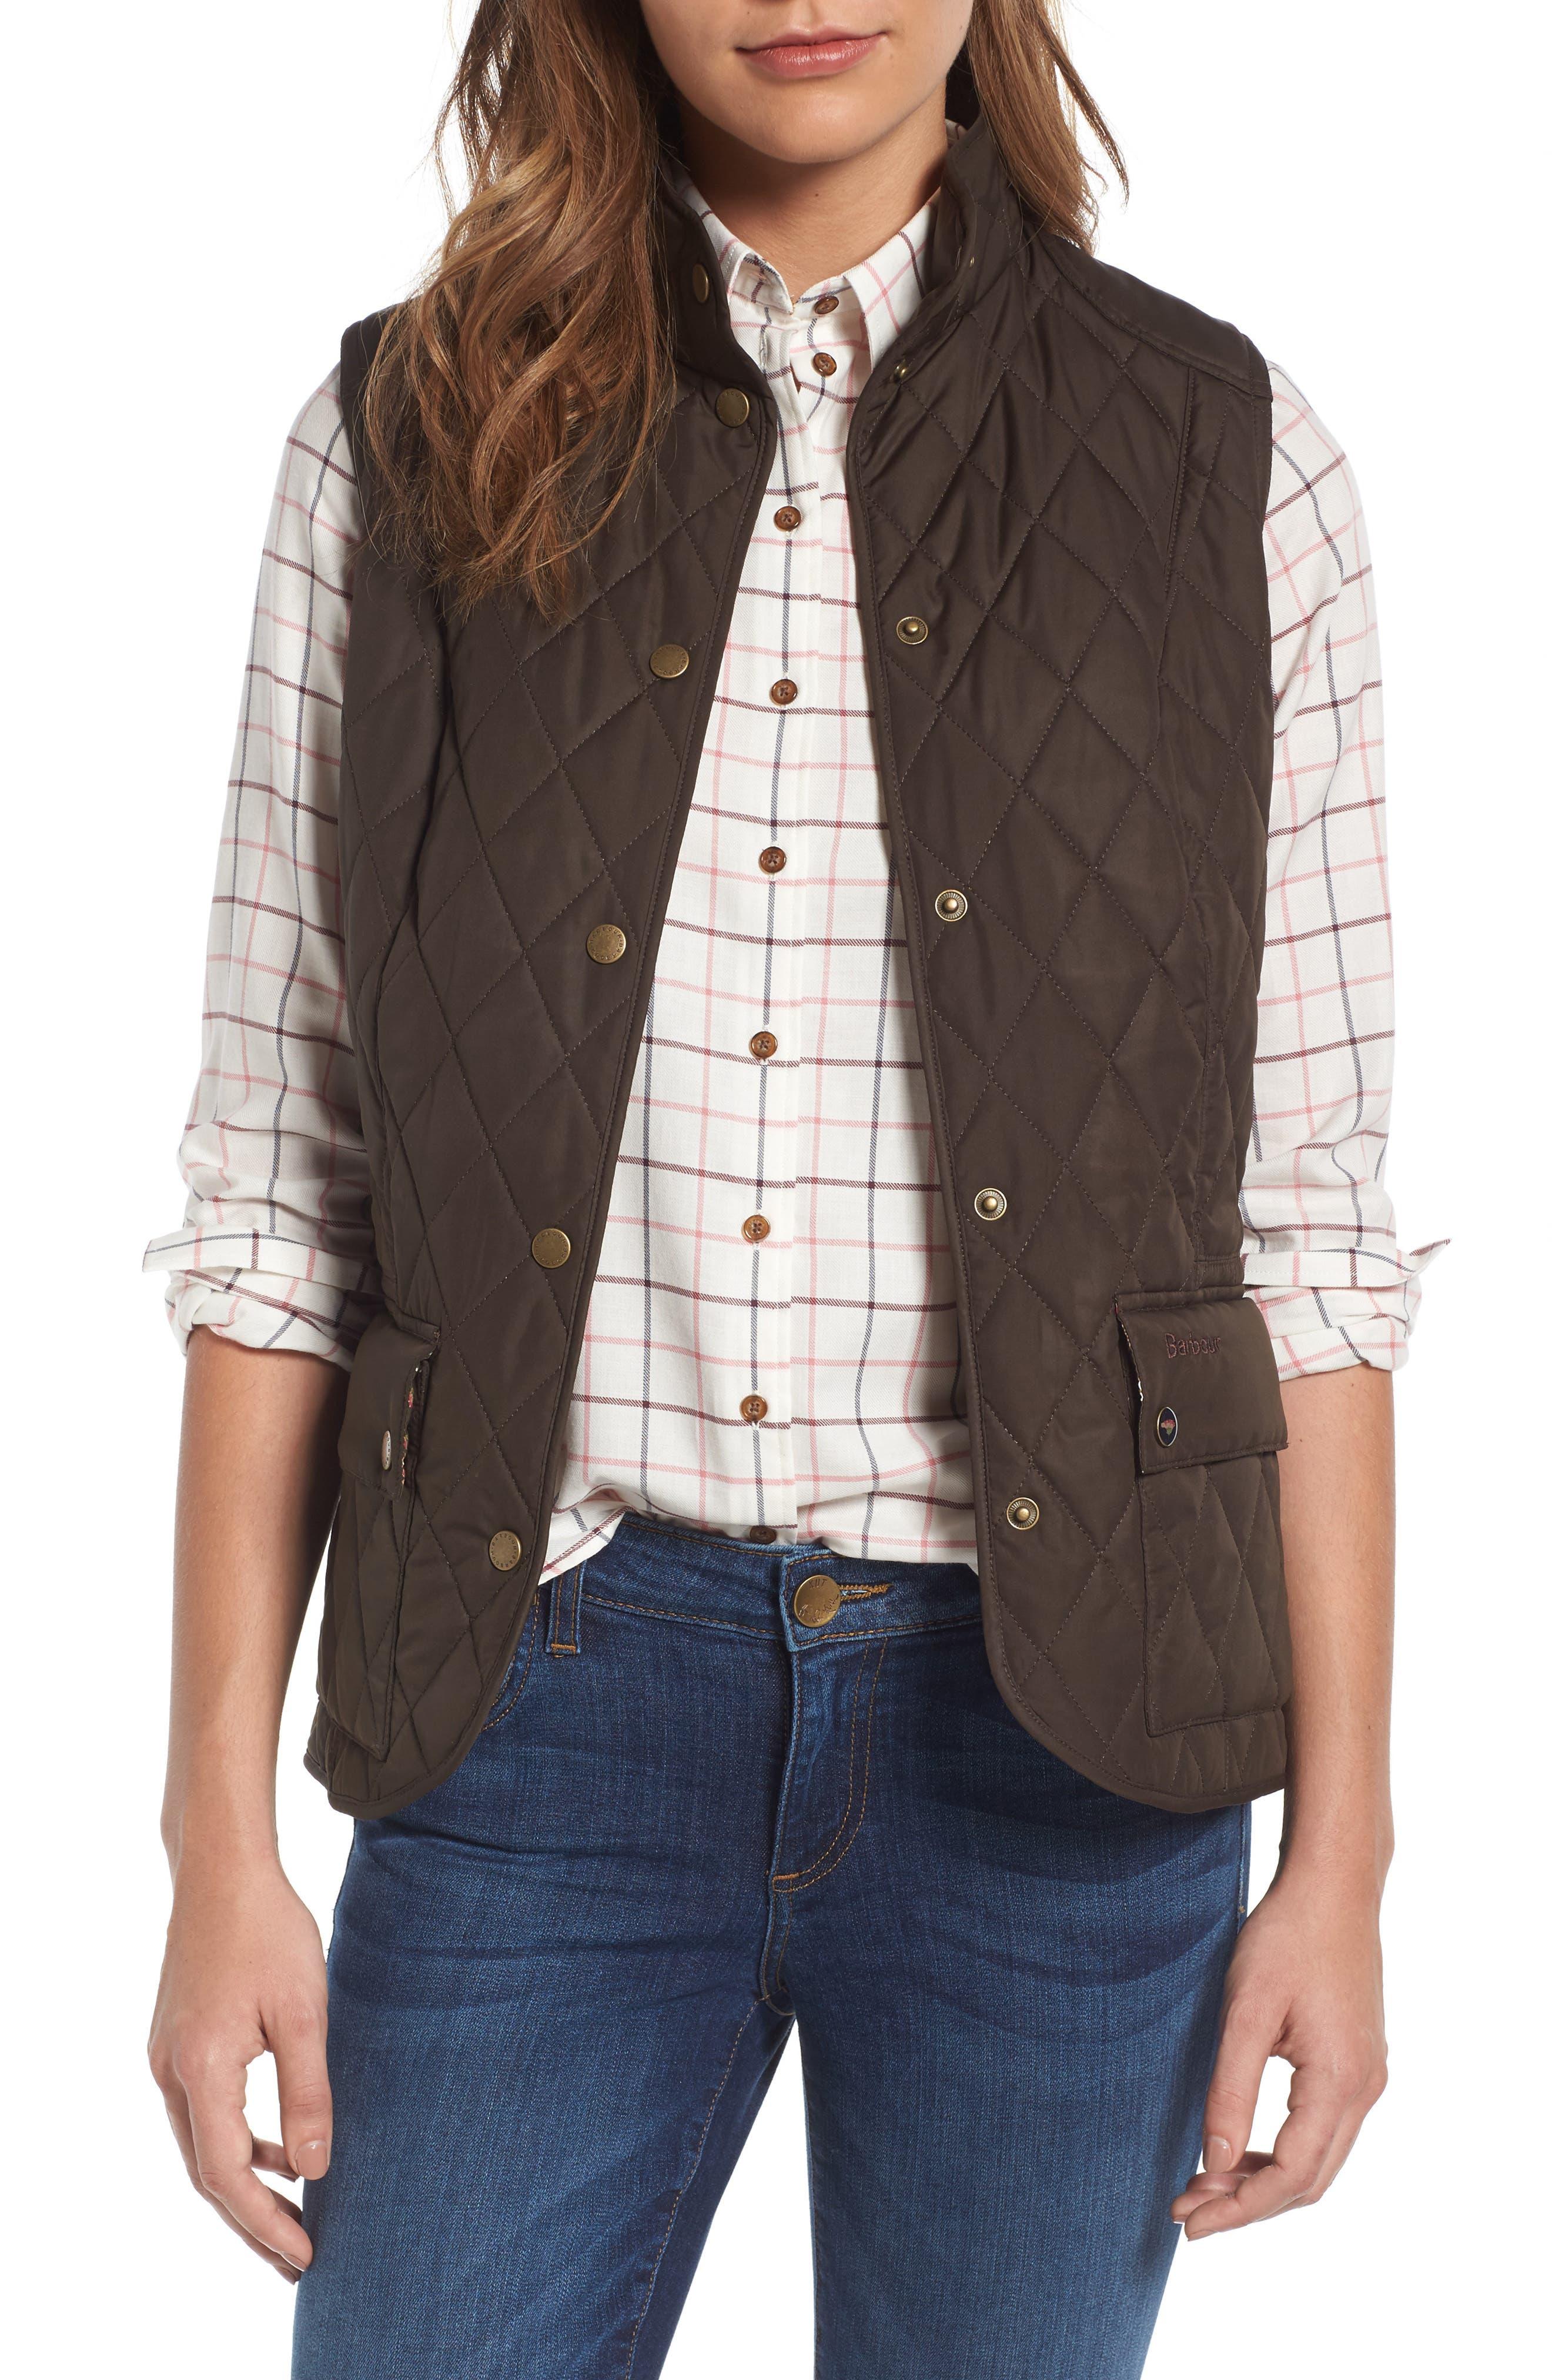 Alternate Image 1 Selected - Barbour Saddleworth Quilted Vest